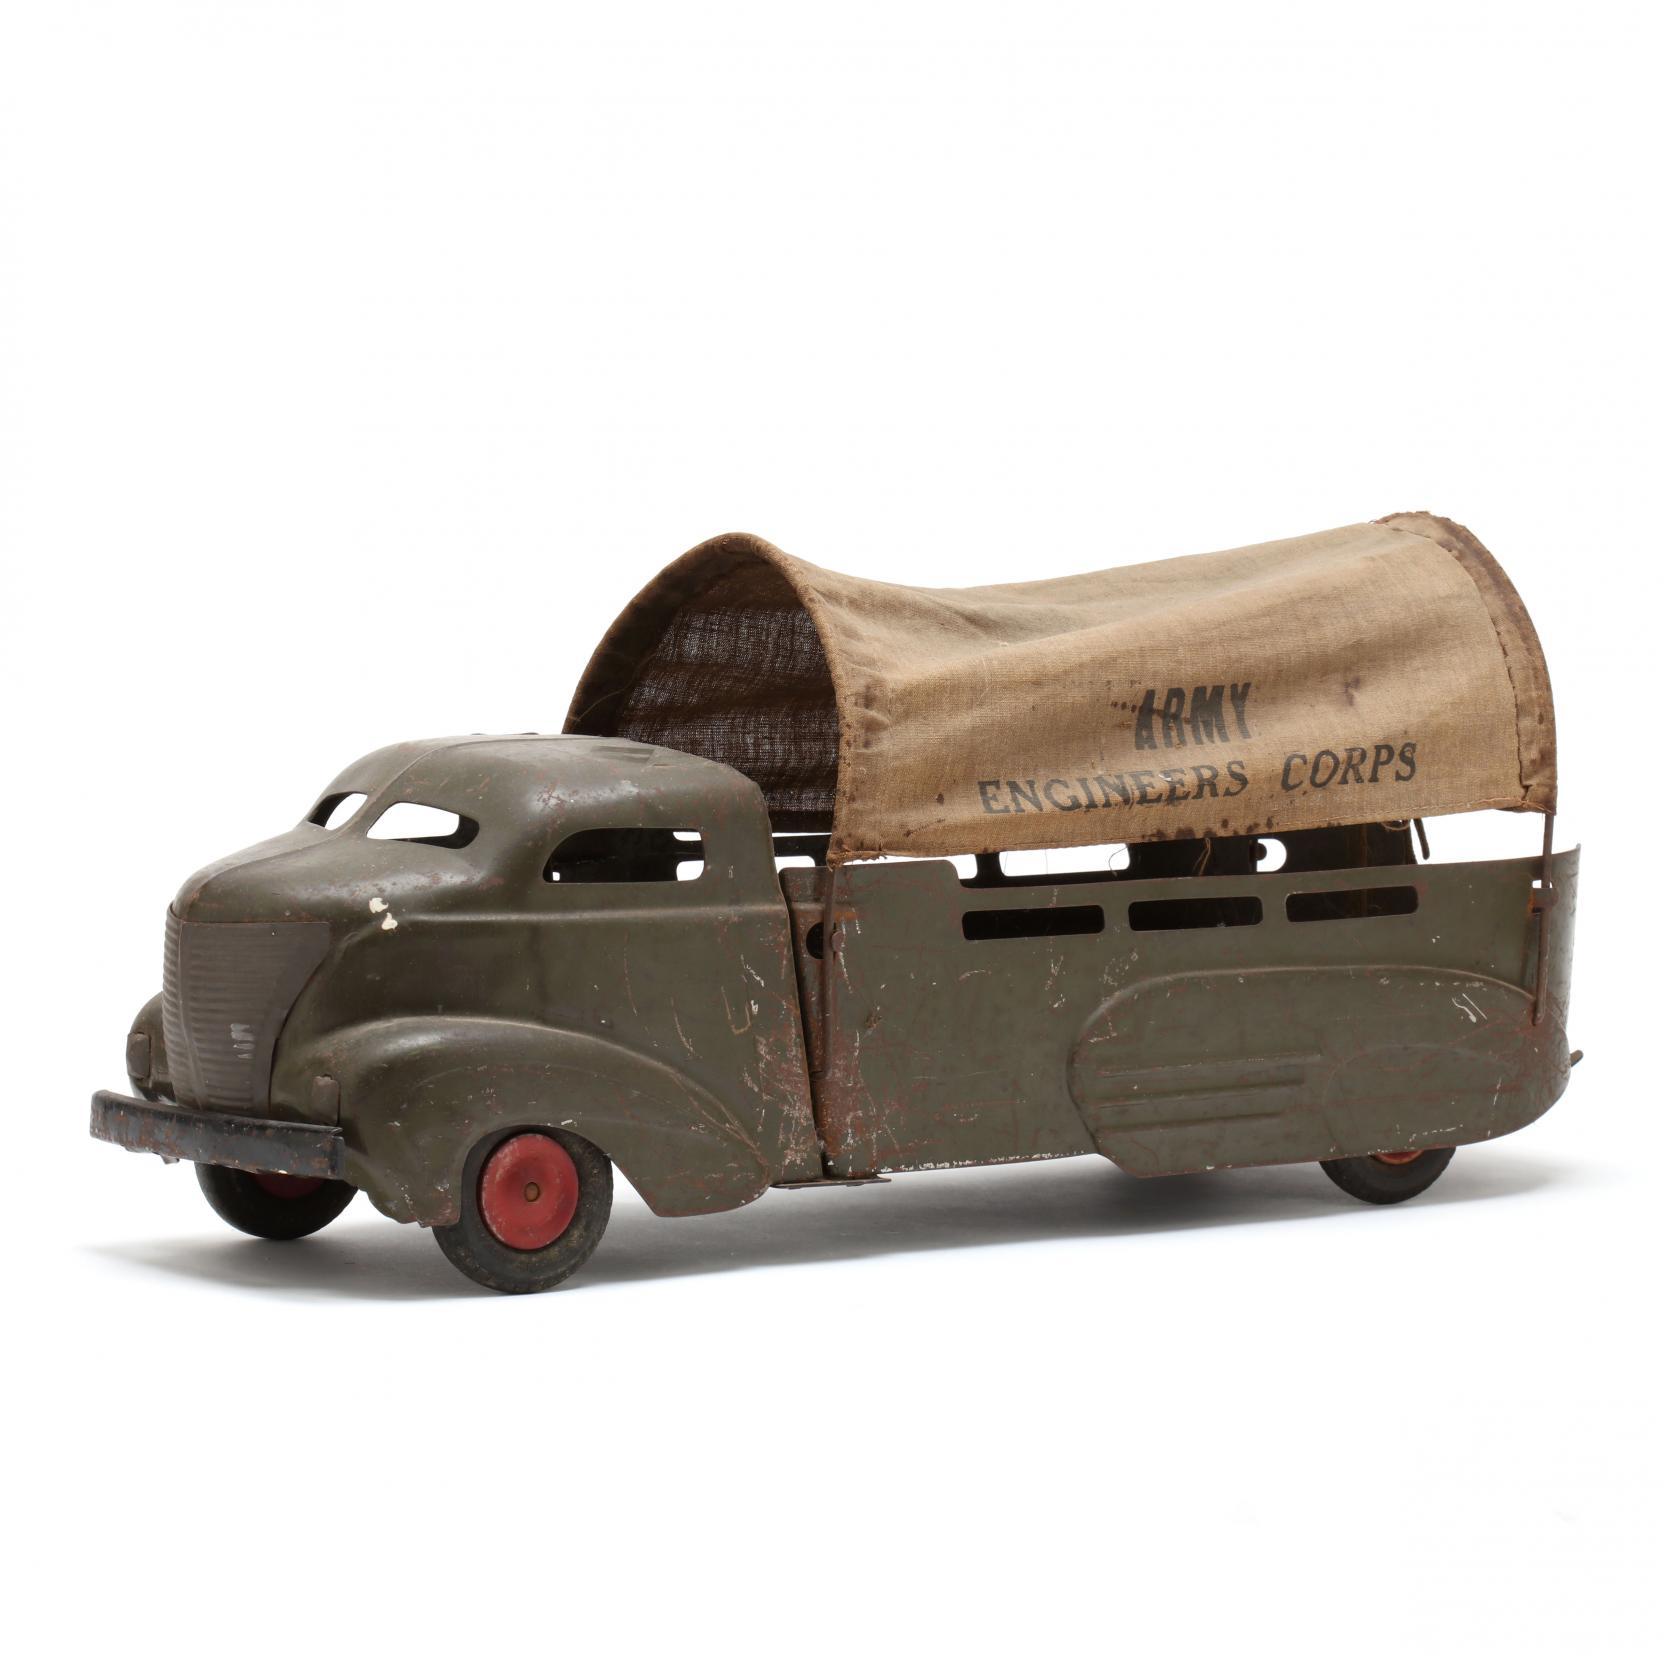 wyandotte-army-engineer-corps-truck